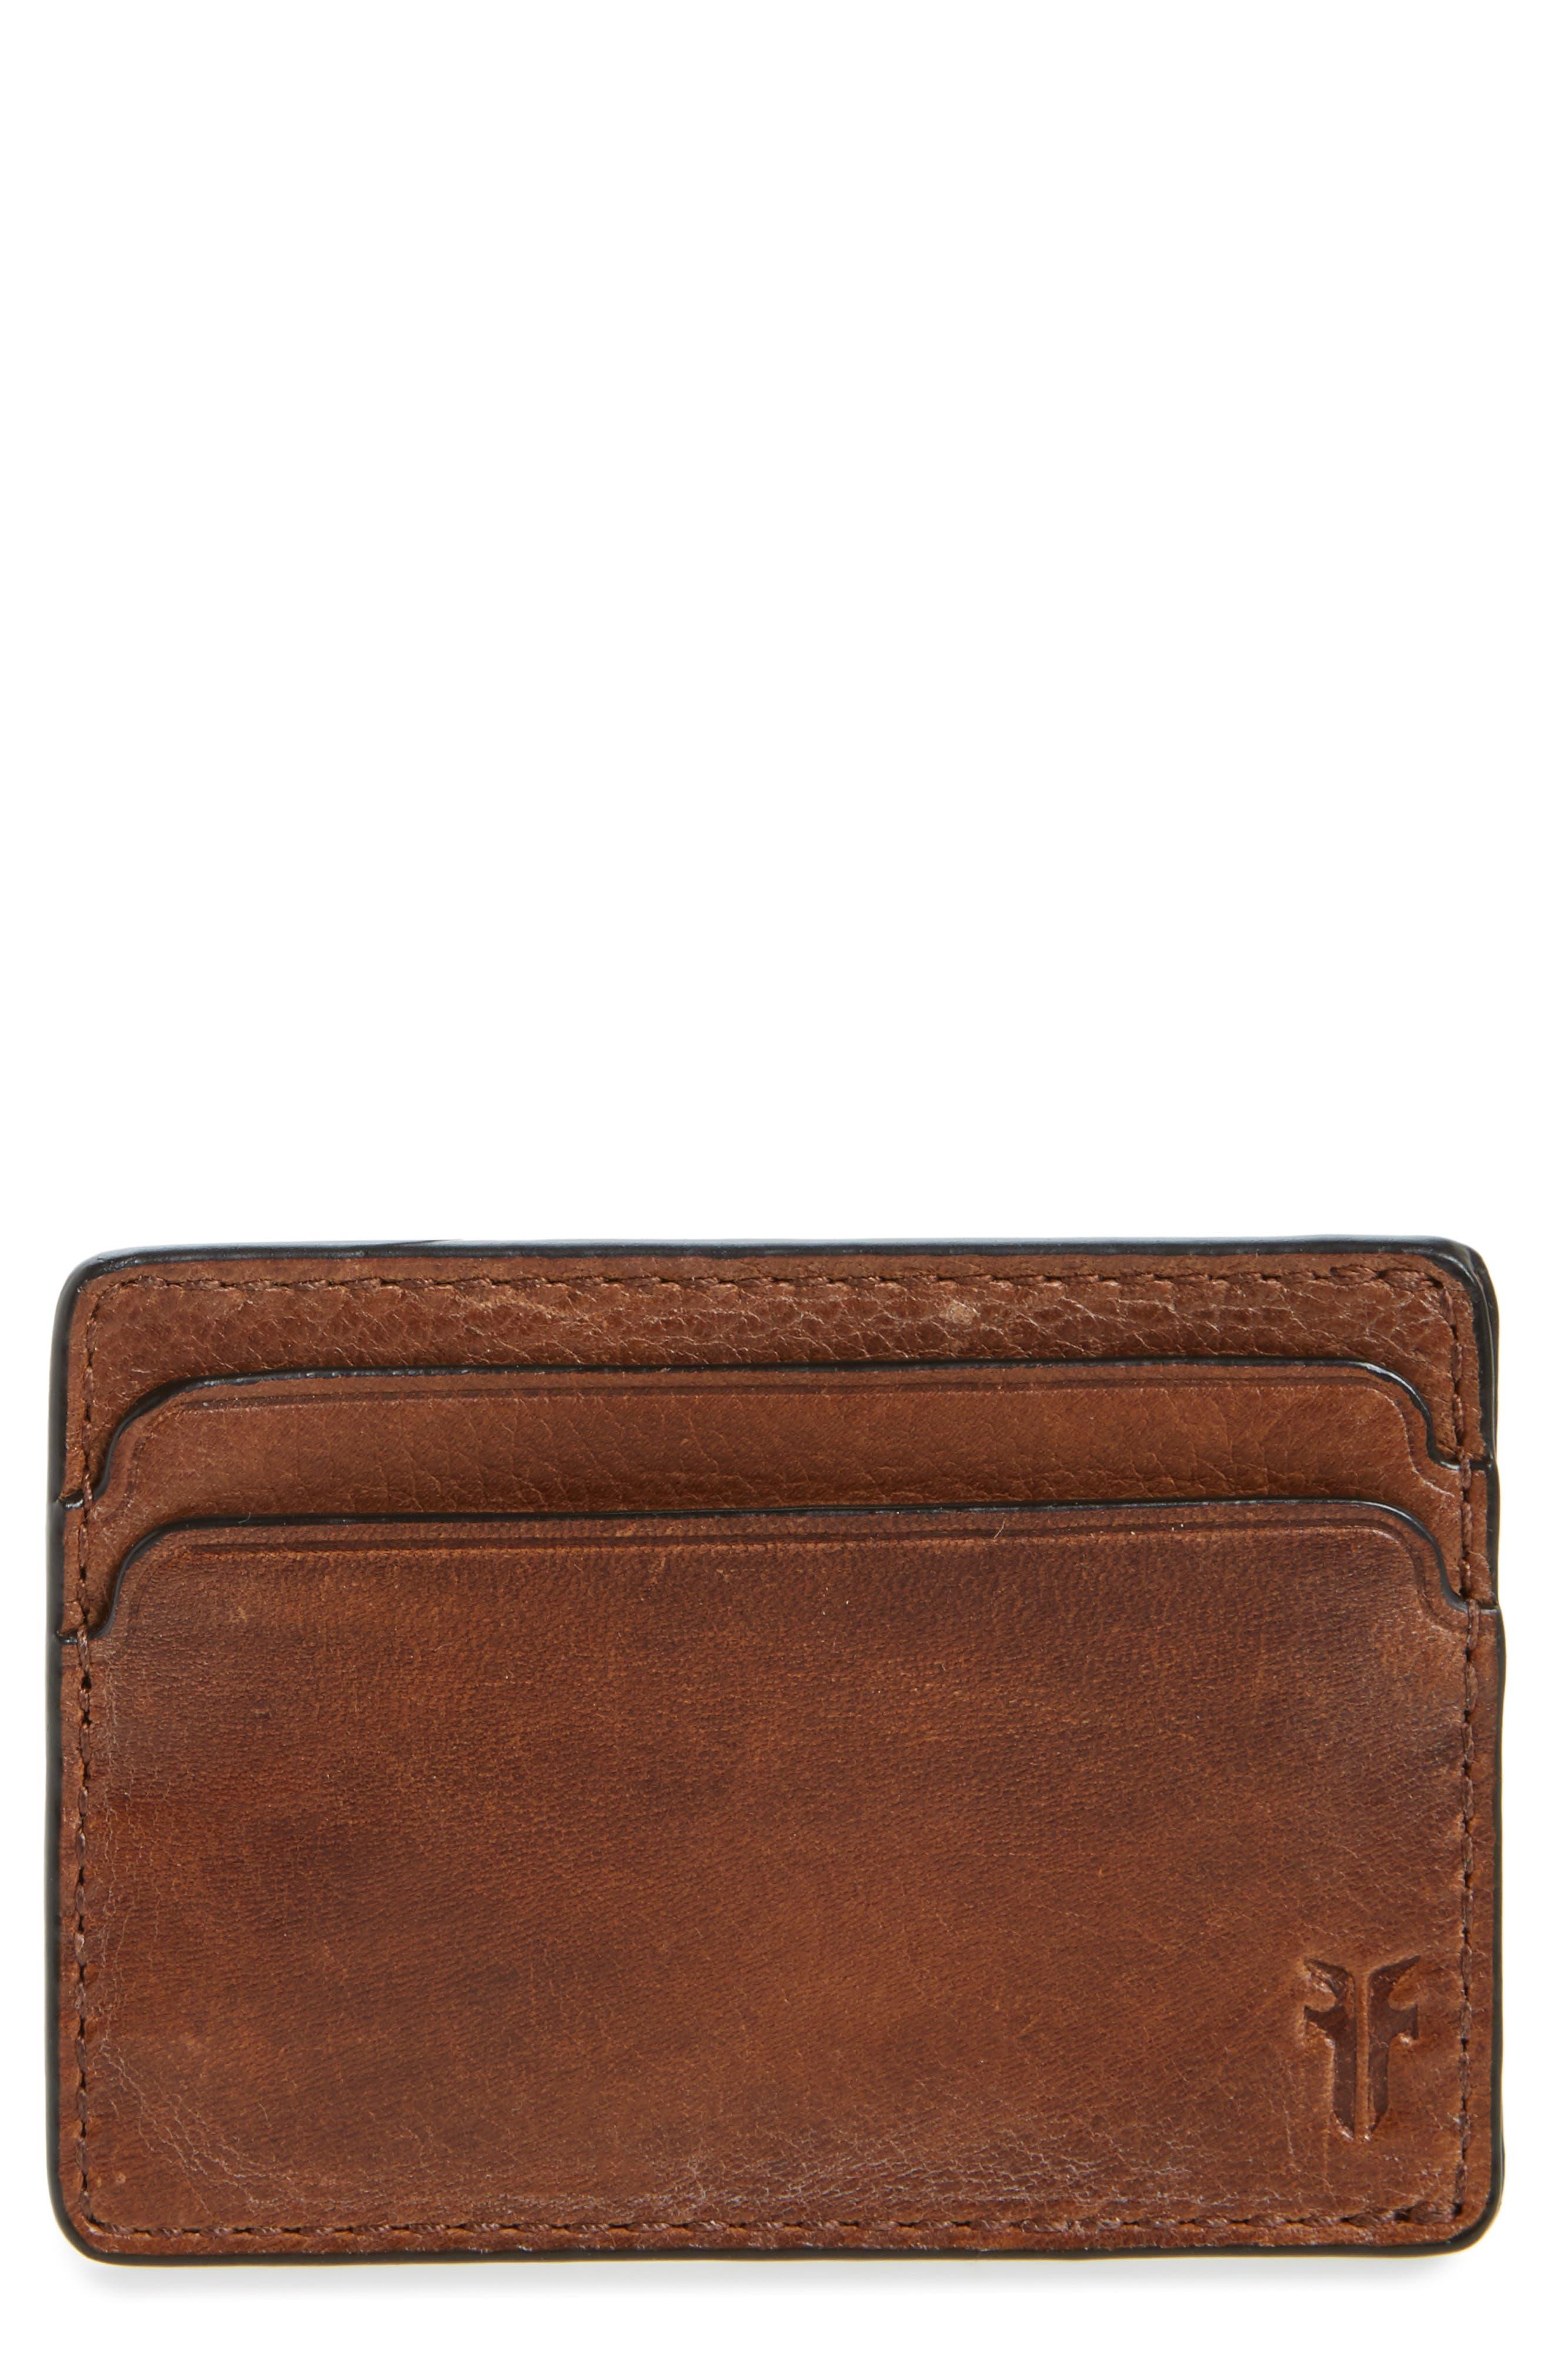 Oliver Leather Card Case,                             Main thumbnail 1, color,                             Cognac